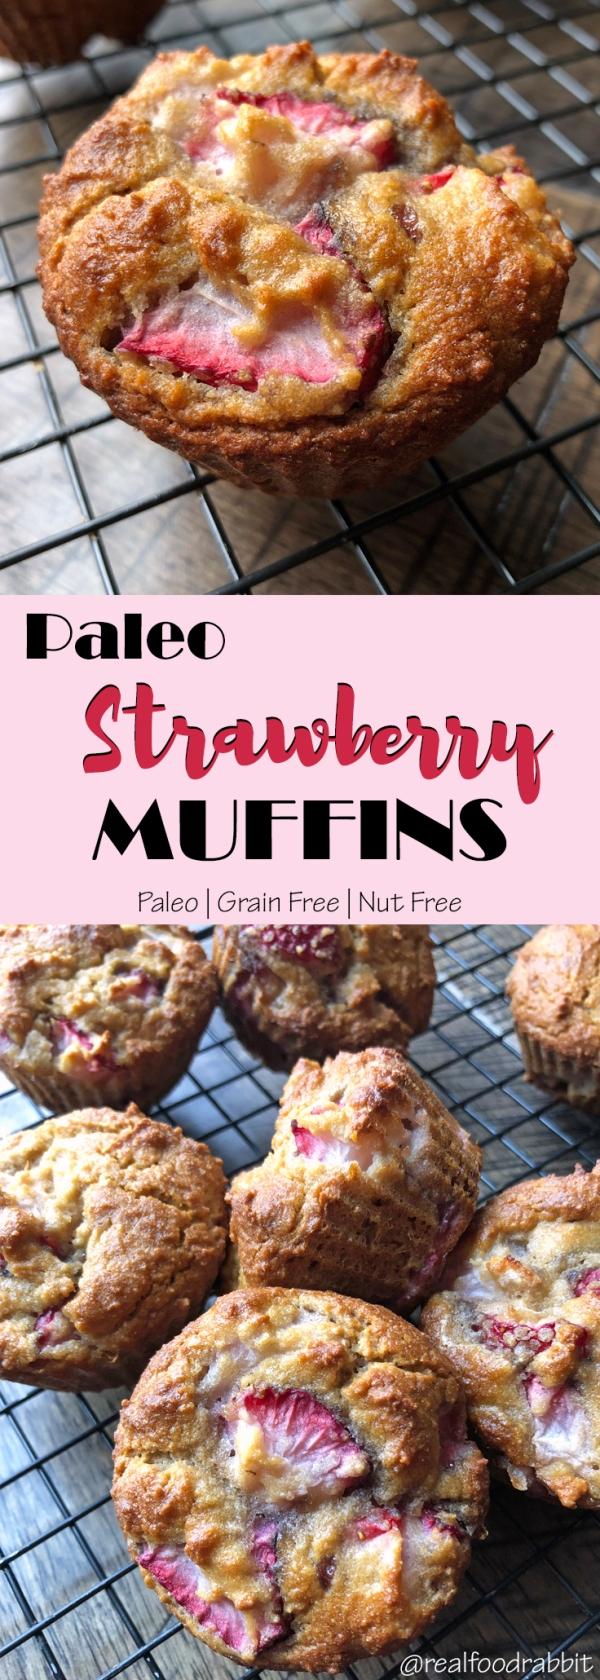 Paleo Strawberry Muffins.jpg